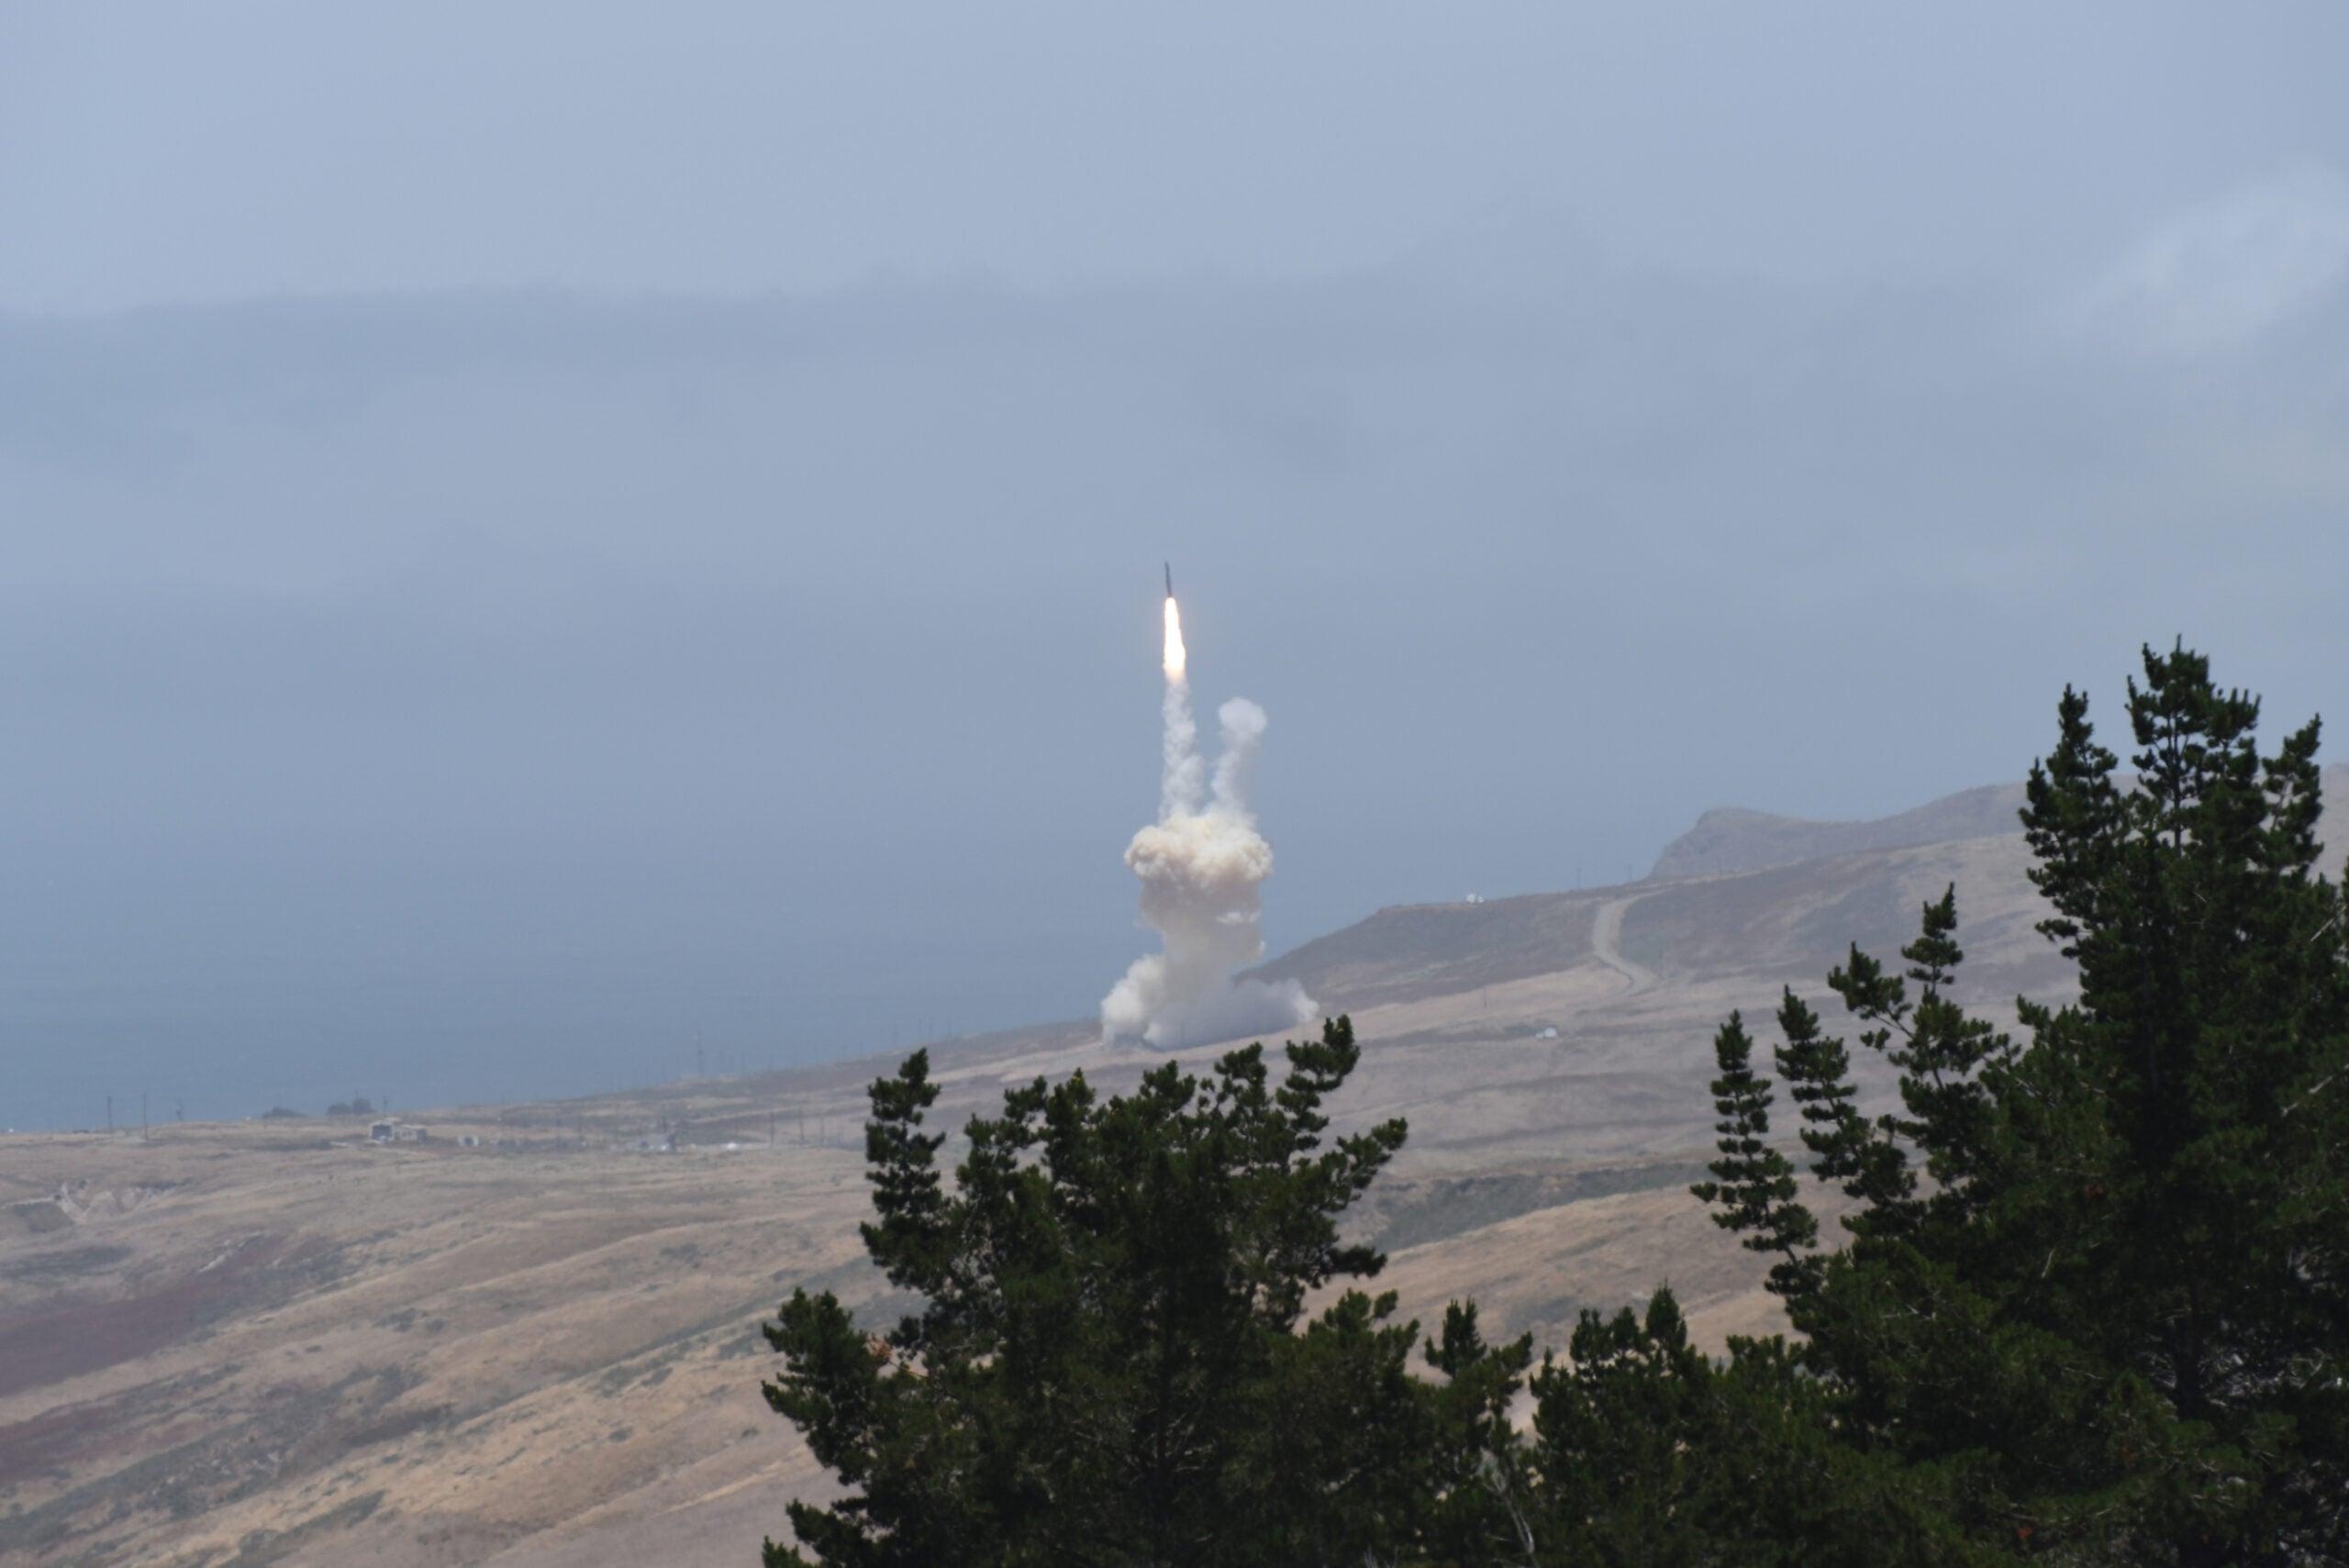 launch of a ballistic missile interceptor